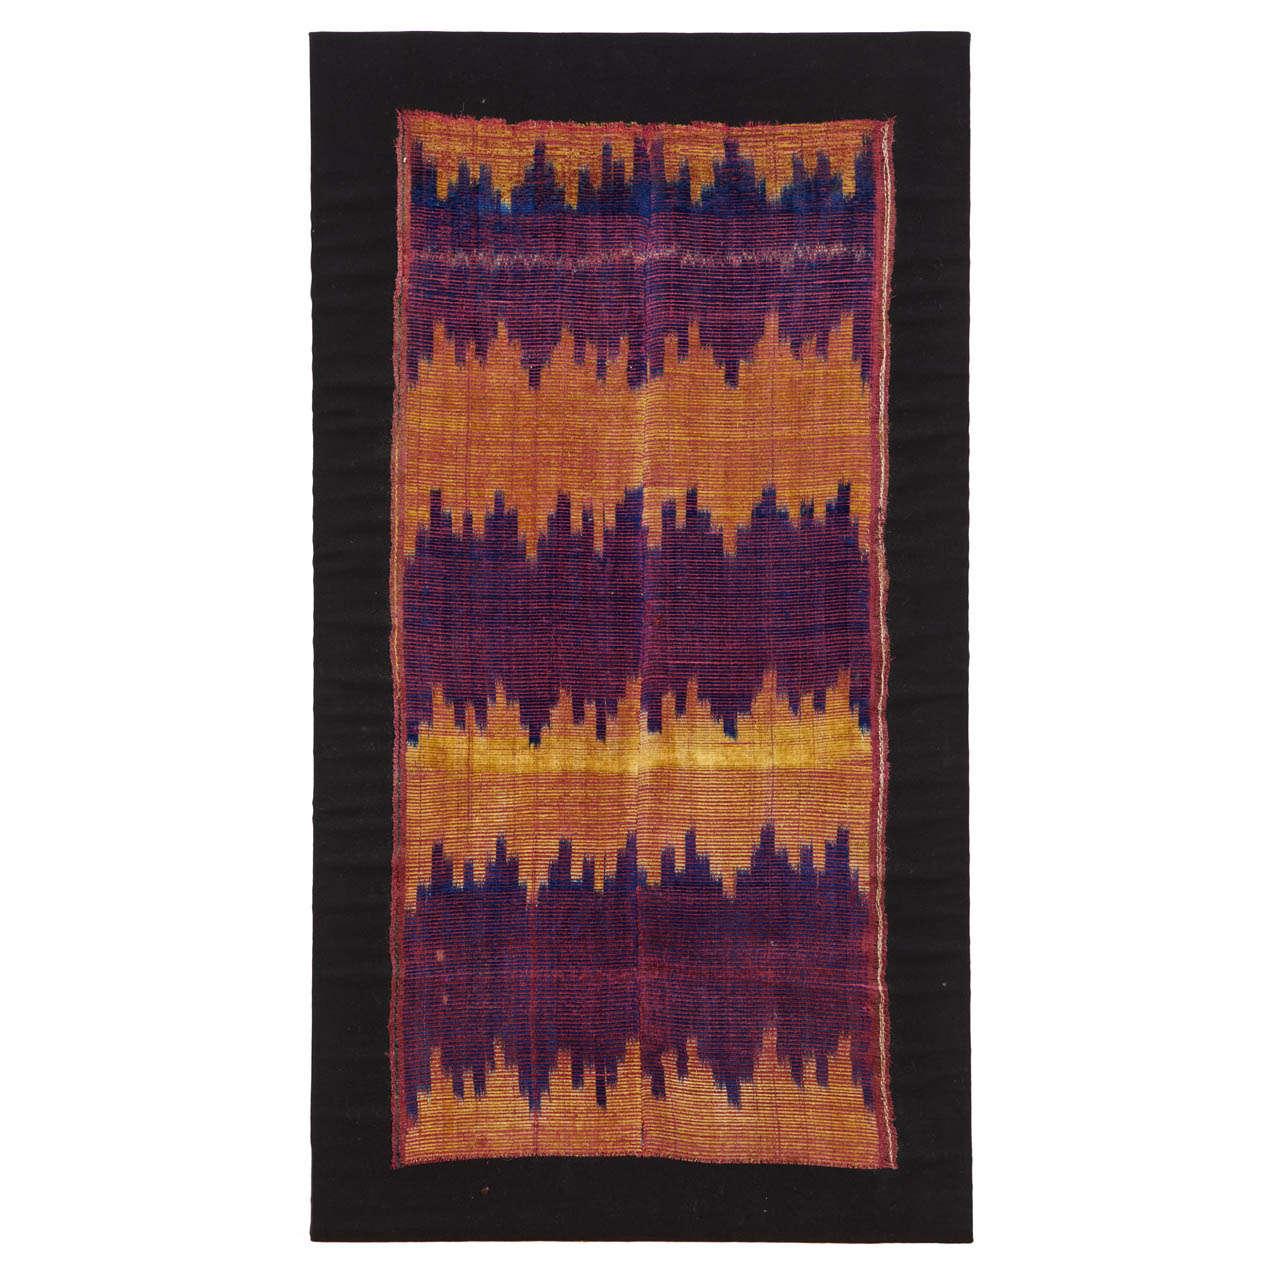 Antique Ikat Silk Velvet Textile